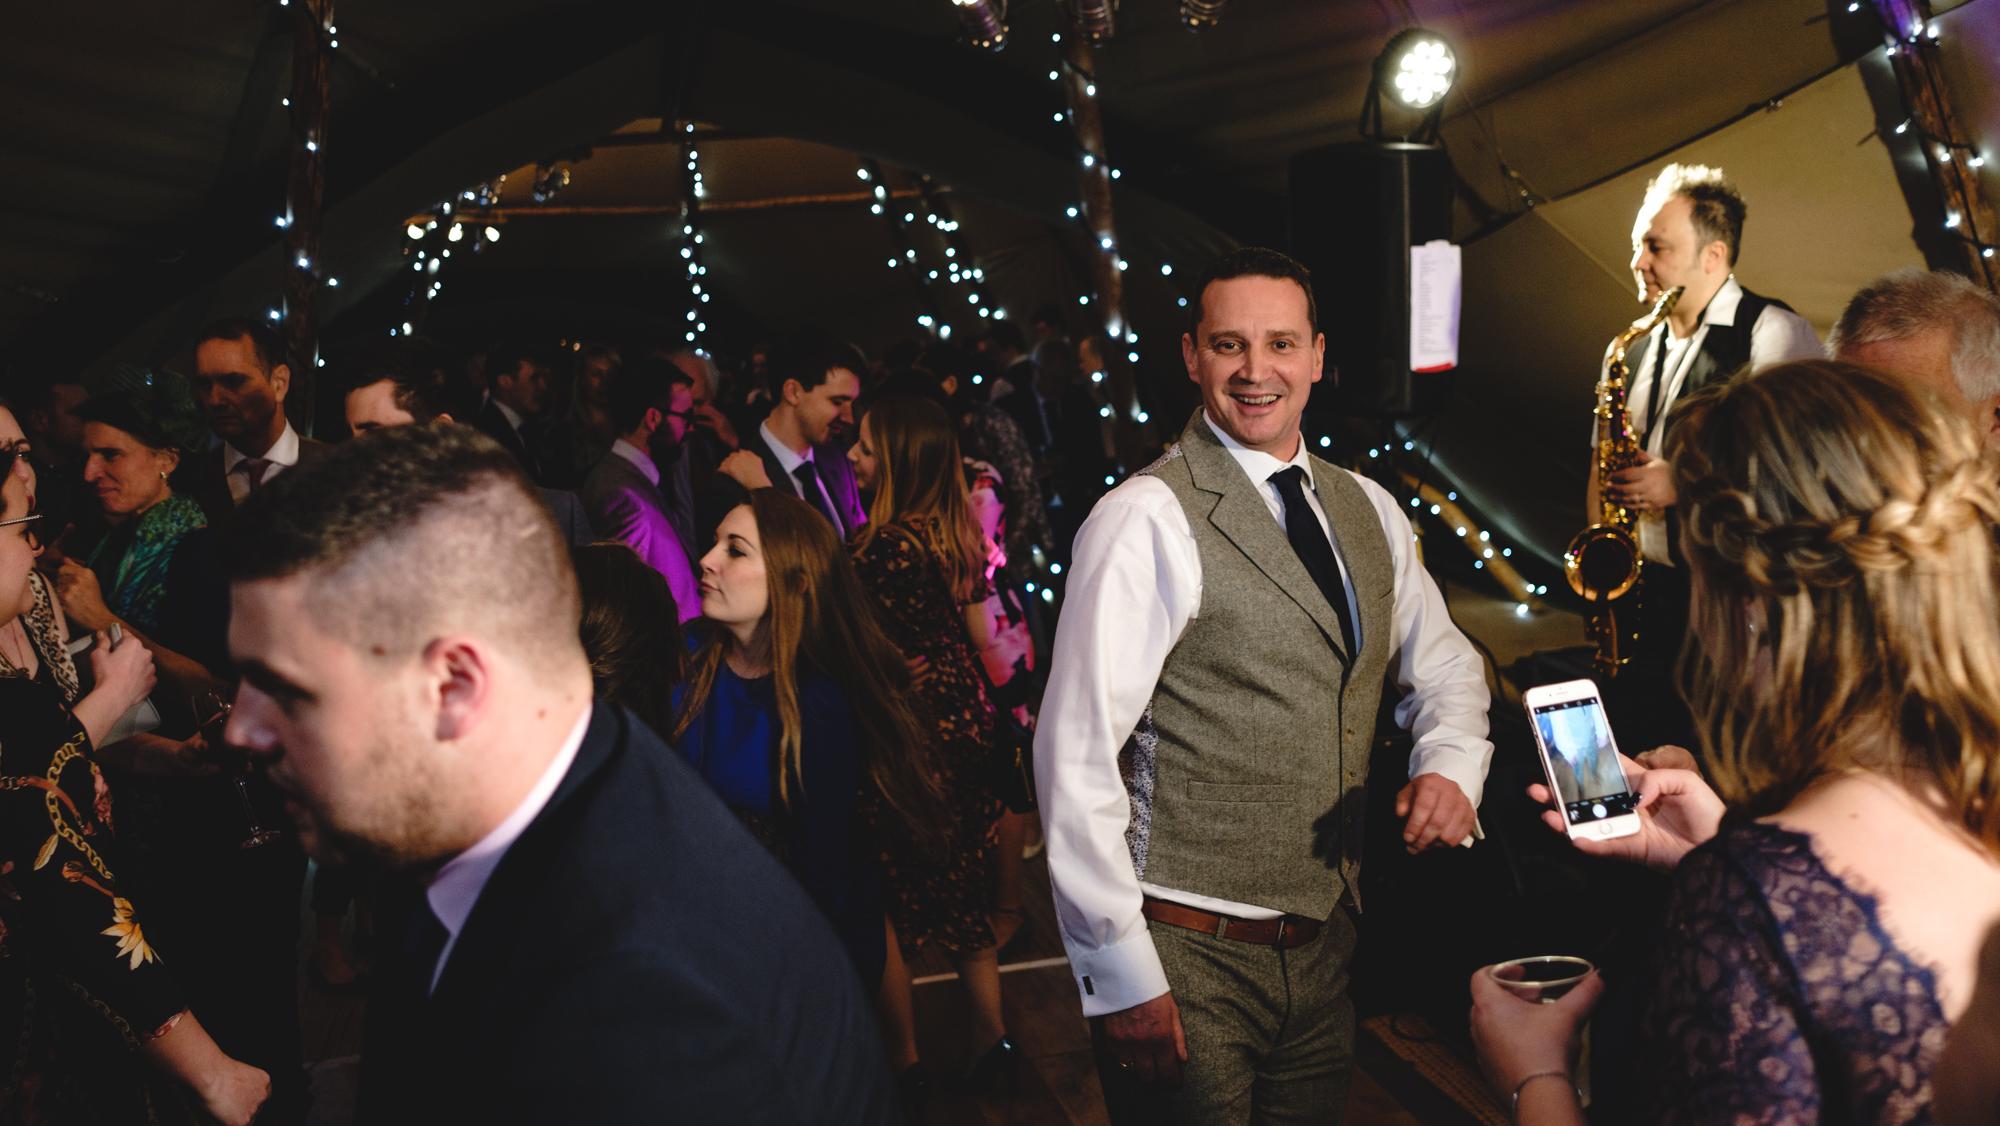 Katie and Dode weddings (200 of 207).jpg